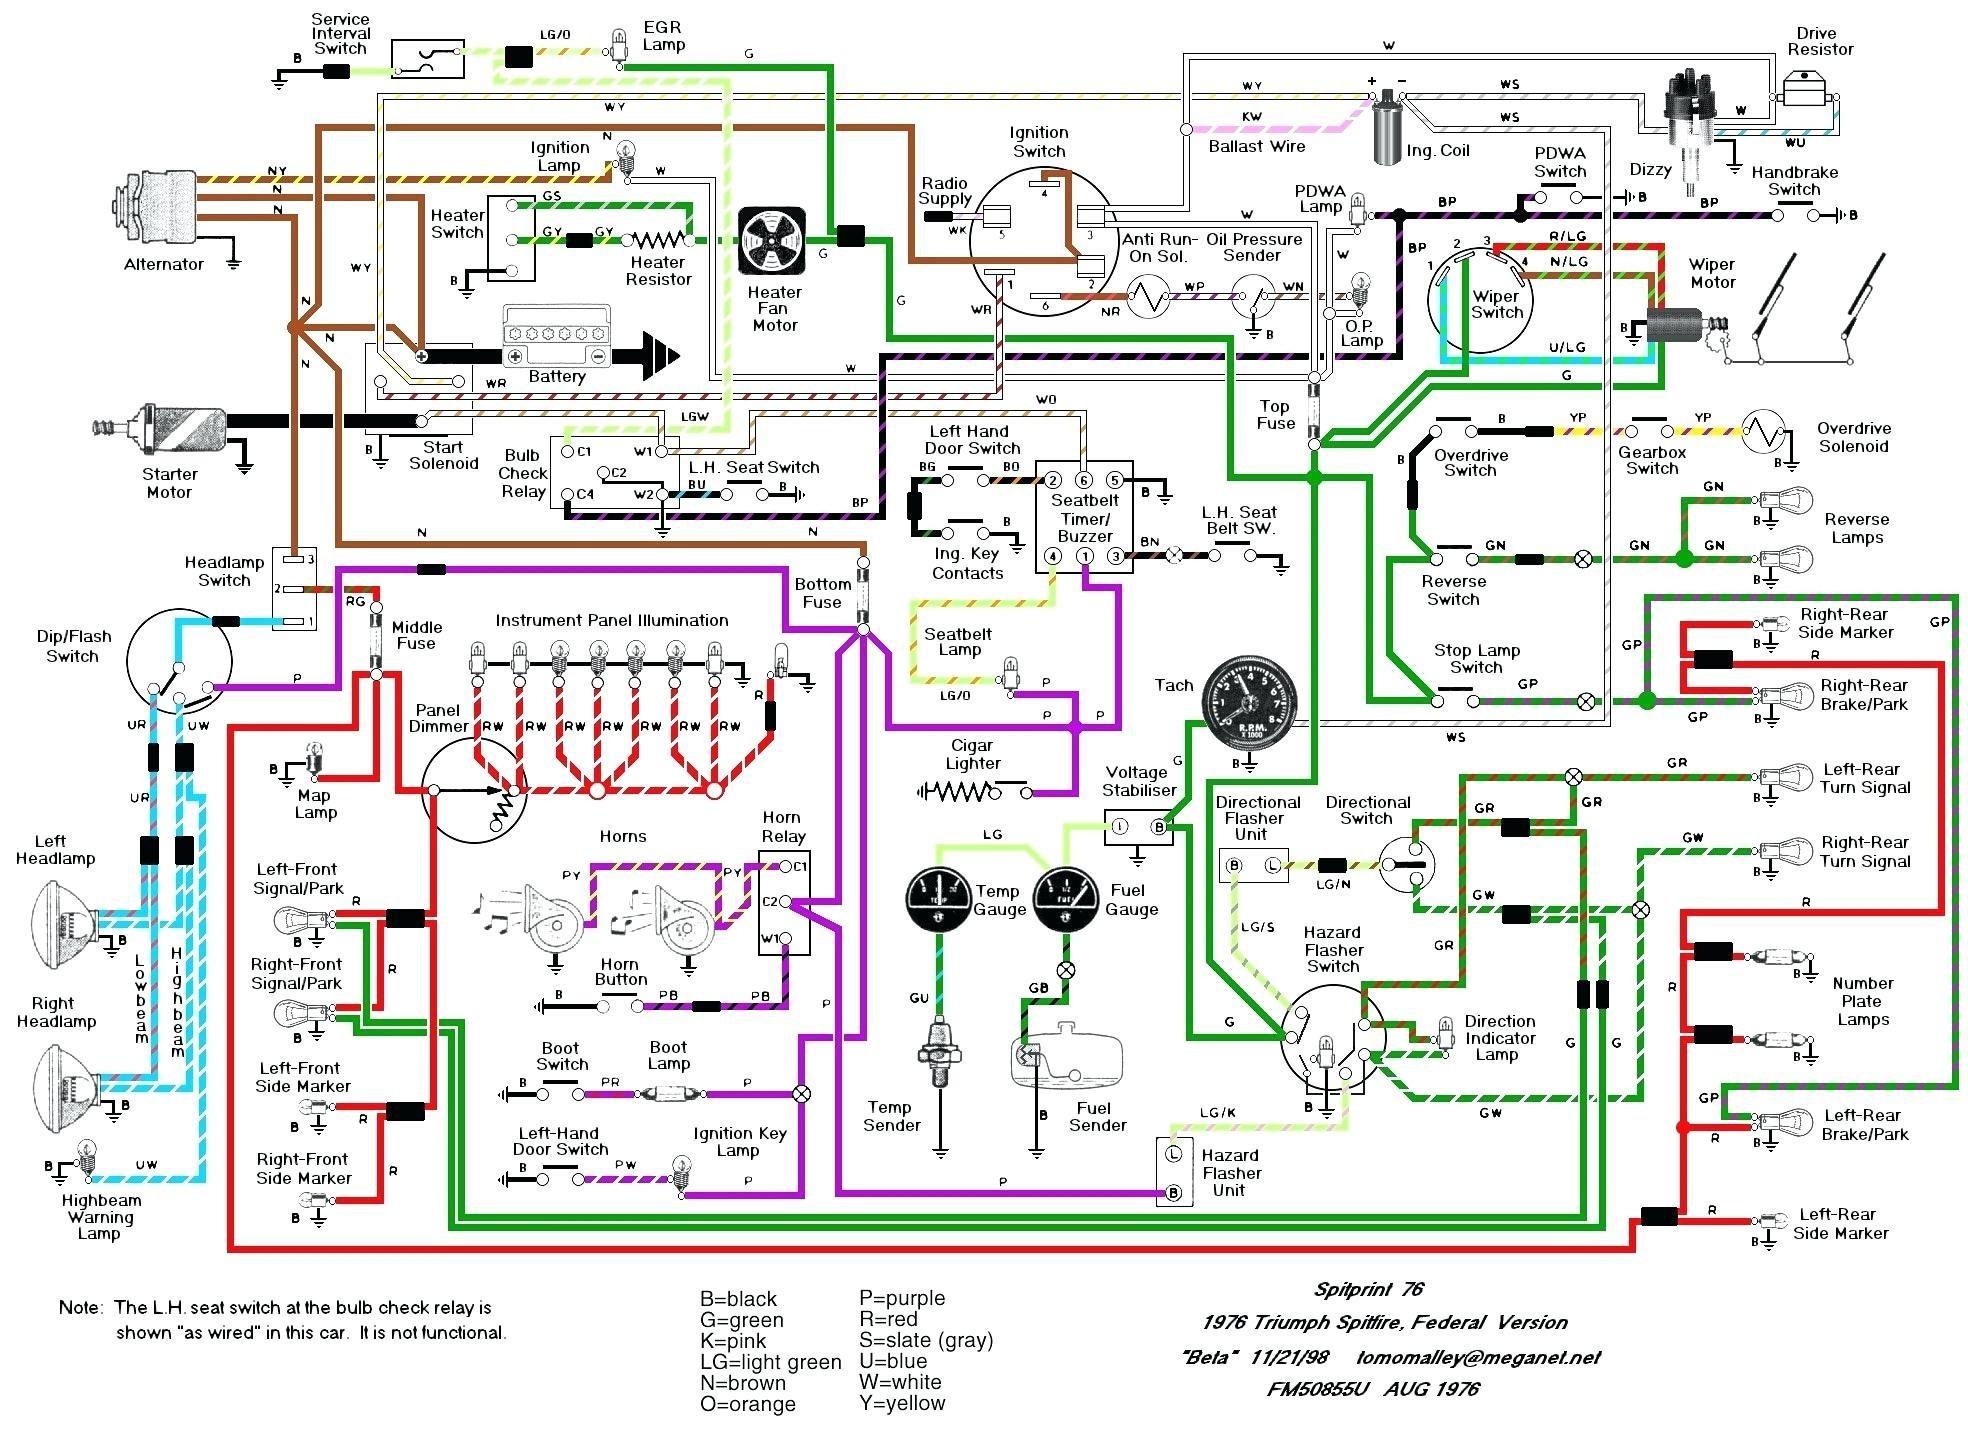 Lenco Trim Tabs Wiring Diagram from mainetreasurechest.com